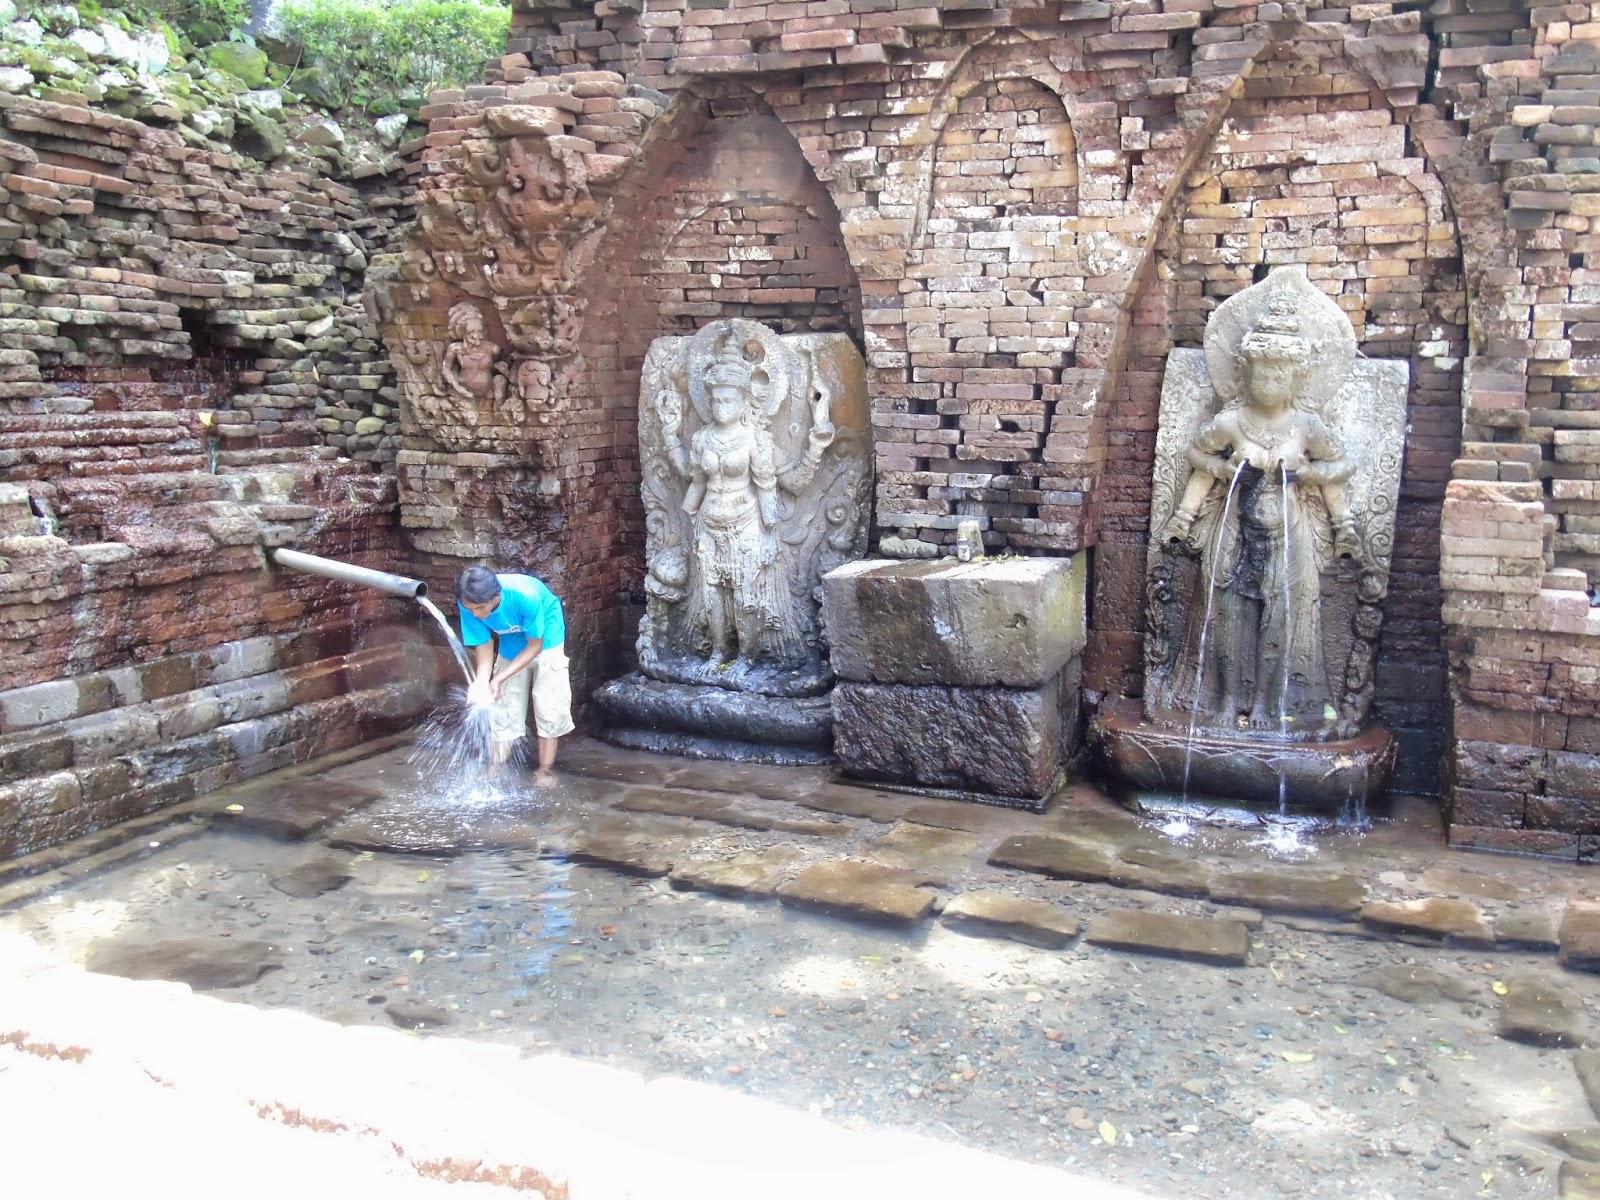 Trip Candi Belahan Sumber Tetek Pasuruan Sidoarjo Jawa Timur Indonesia